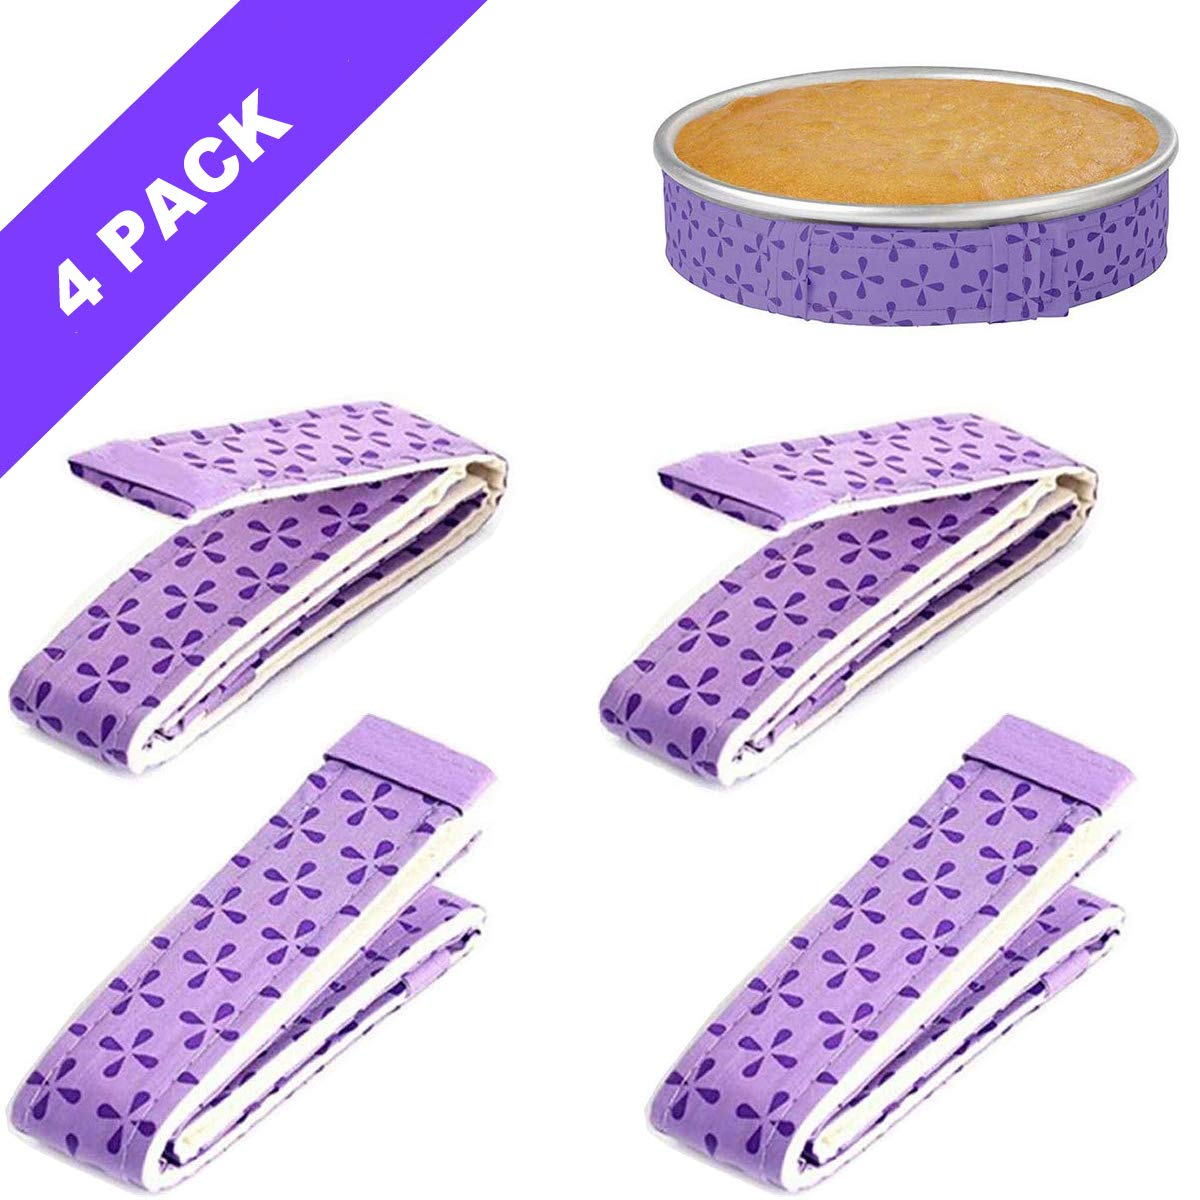 4-Piece Bake Even Strip,Cake Pan Strips,Super Absorbent Thick Cotton,Cake Strips for Baking,Cake Pan Strips